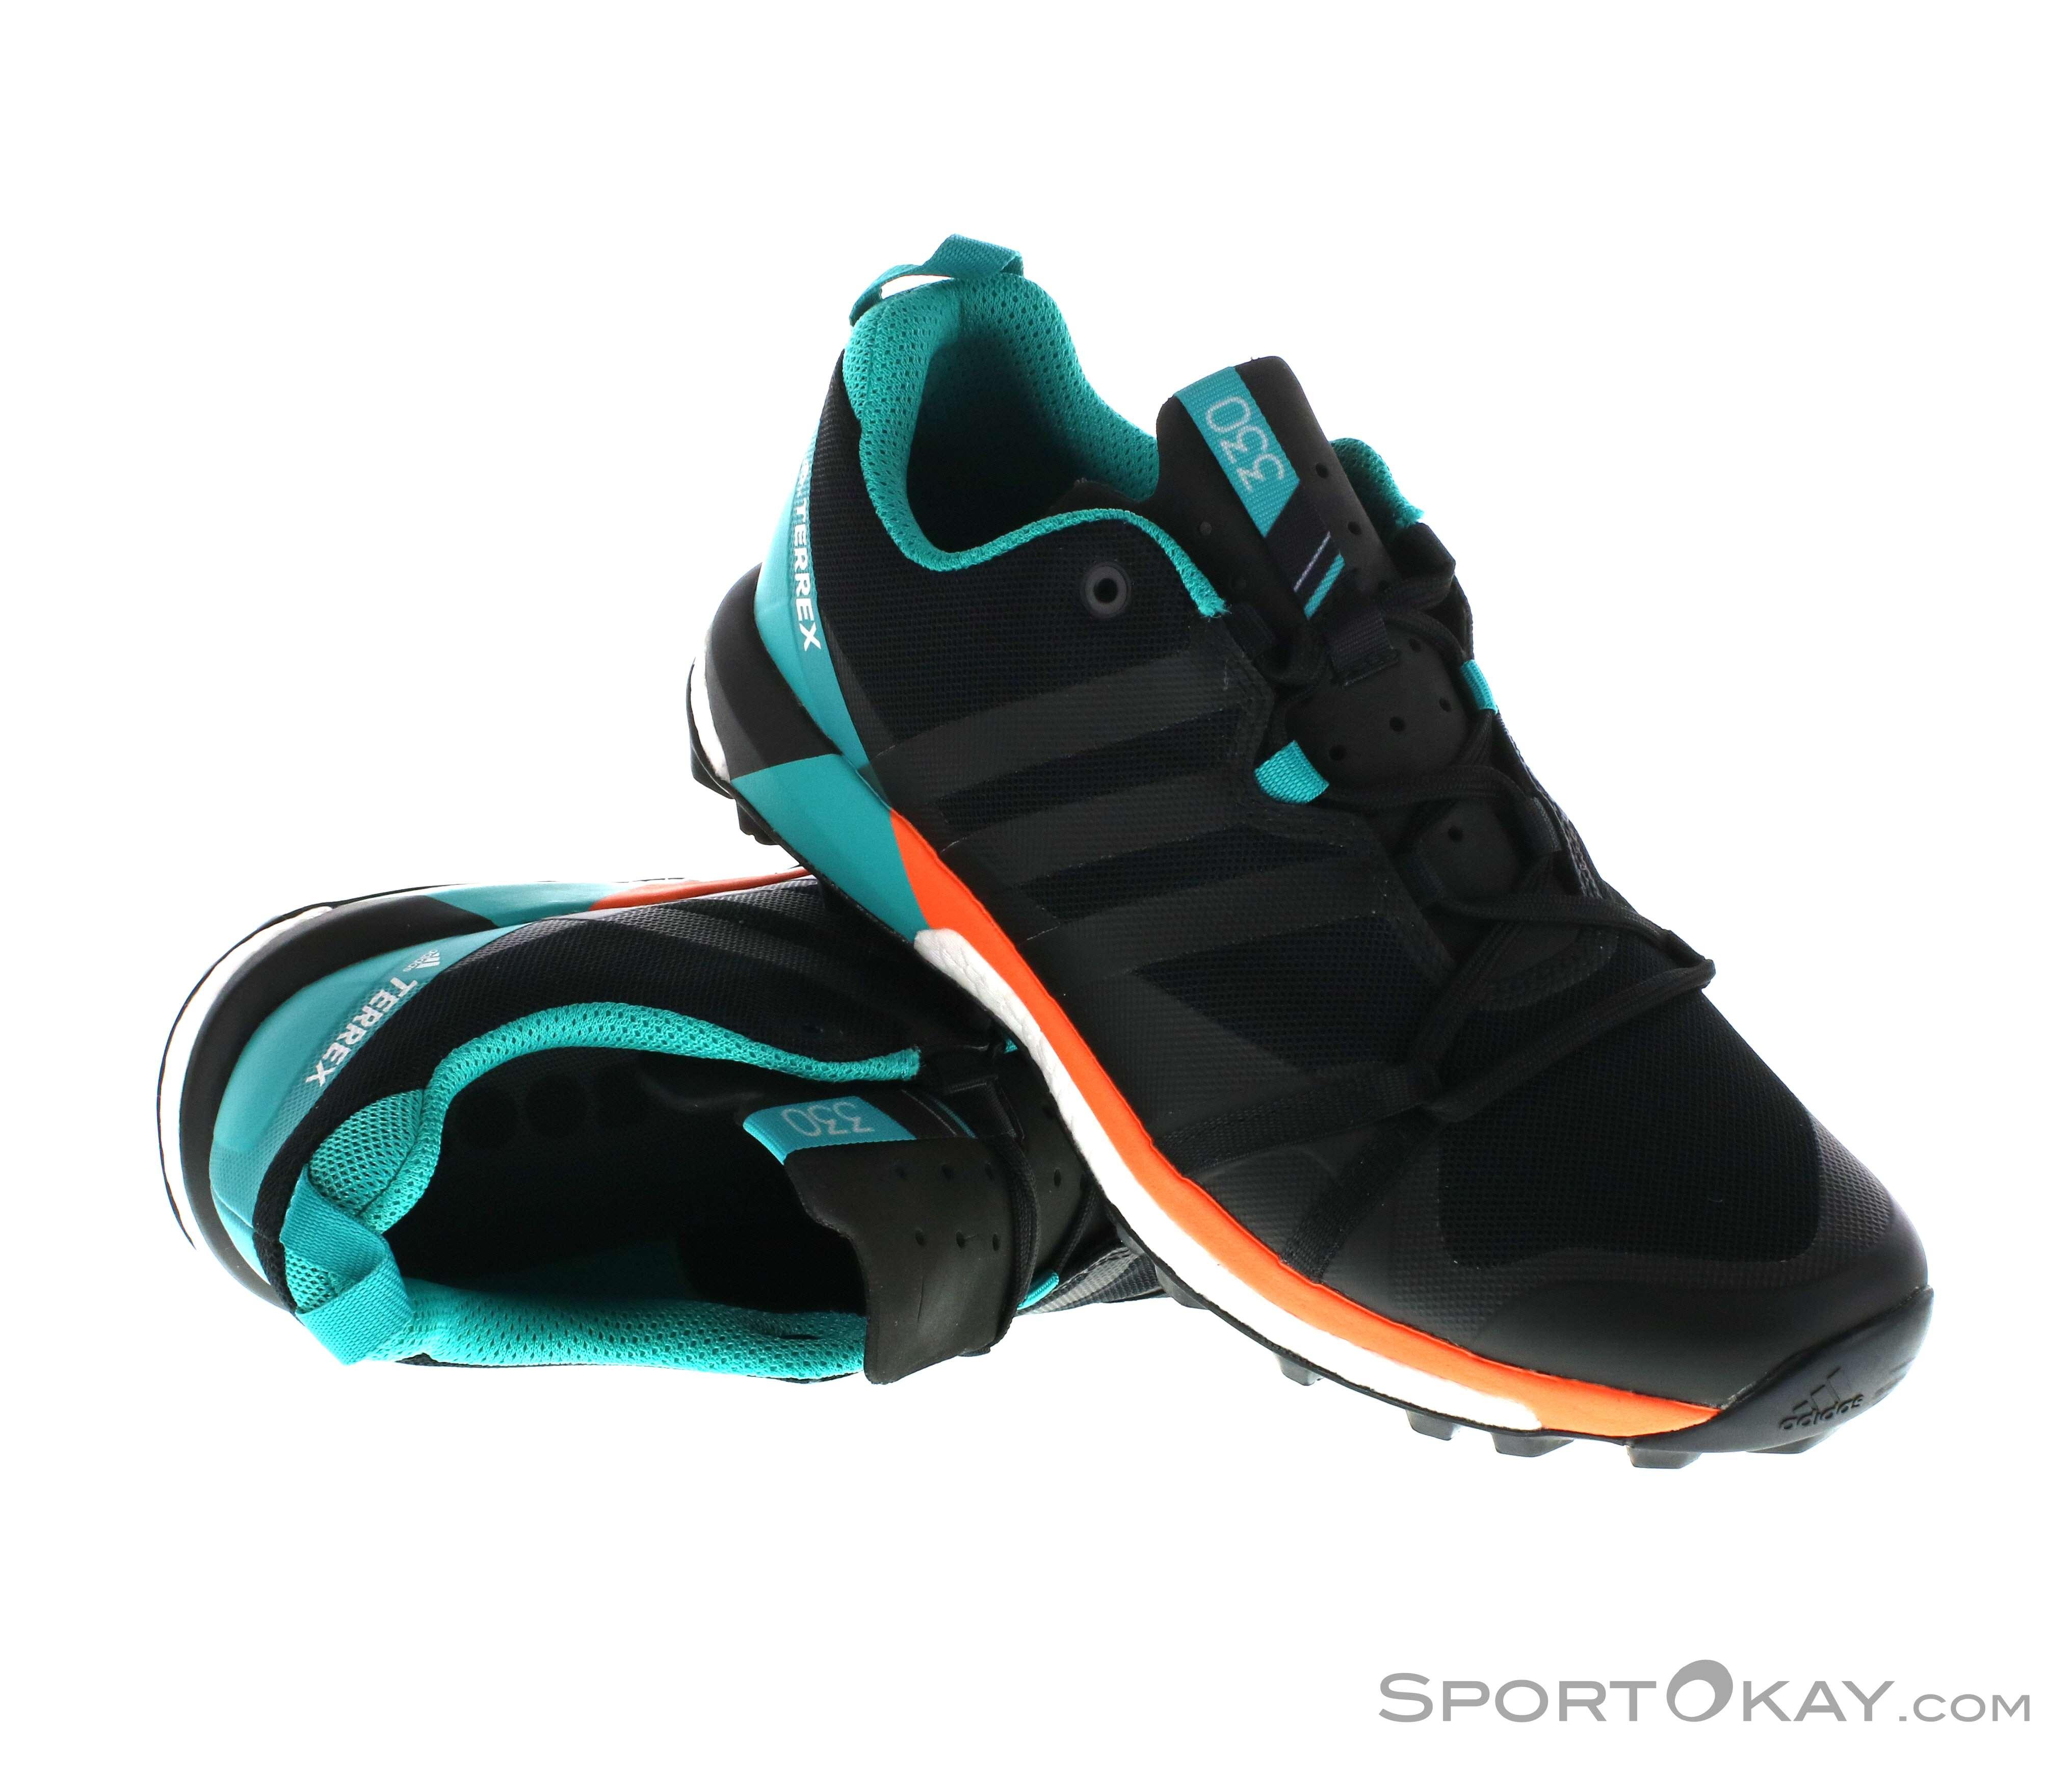 check out ffc35 83b6b adidas Terrex Agravic Uomo Scarpe da Trail Running, adidas, Nero, , Uomo,